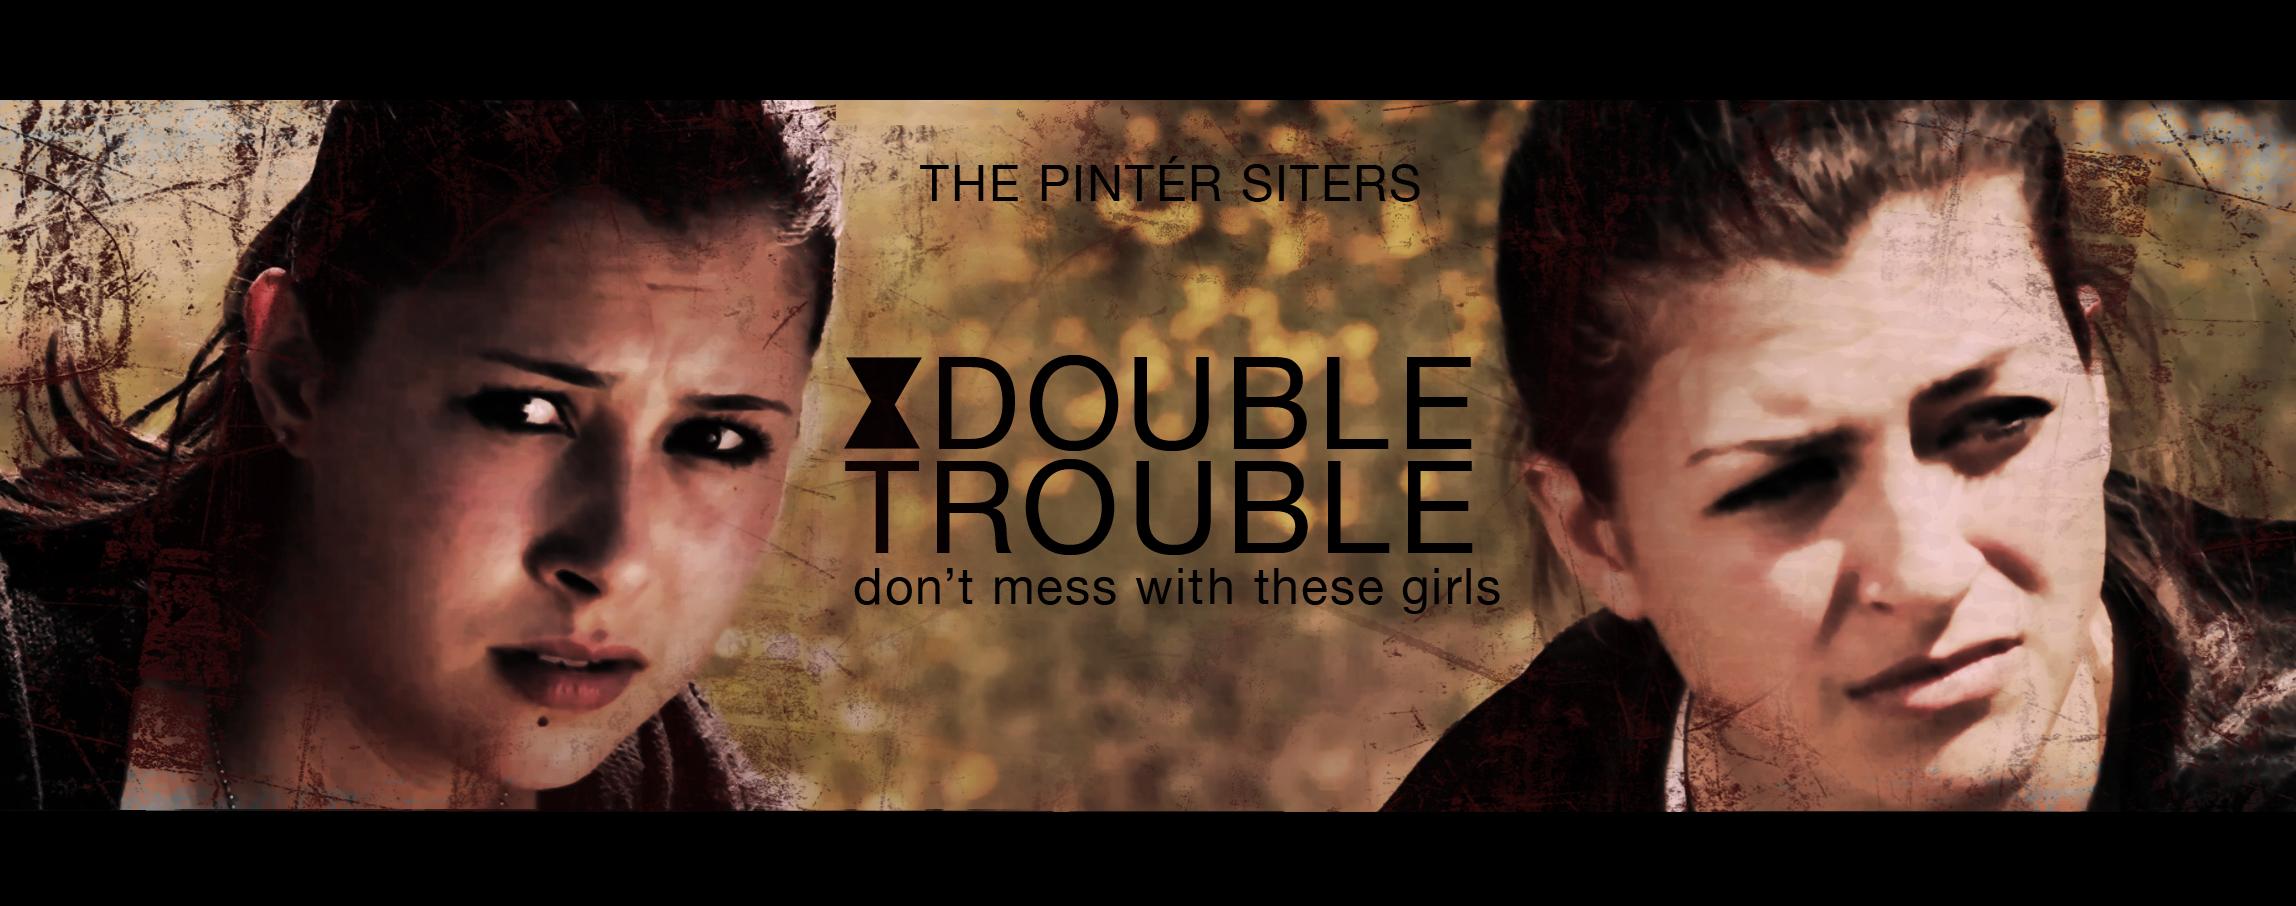 Pintér_sisters_3